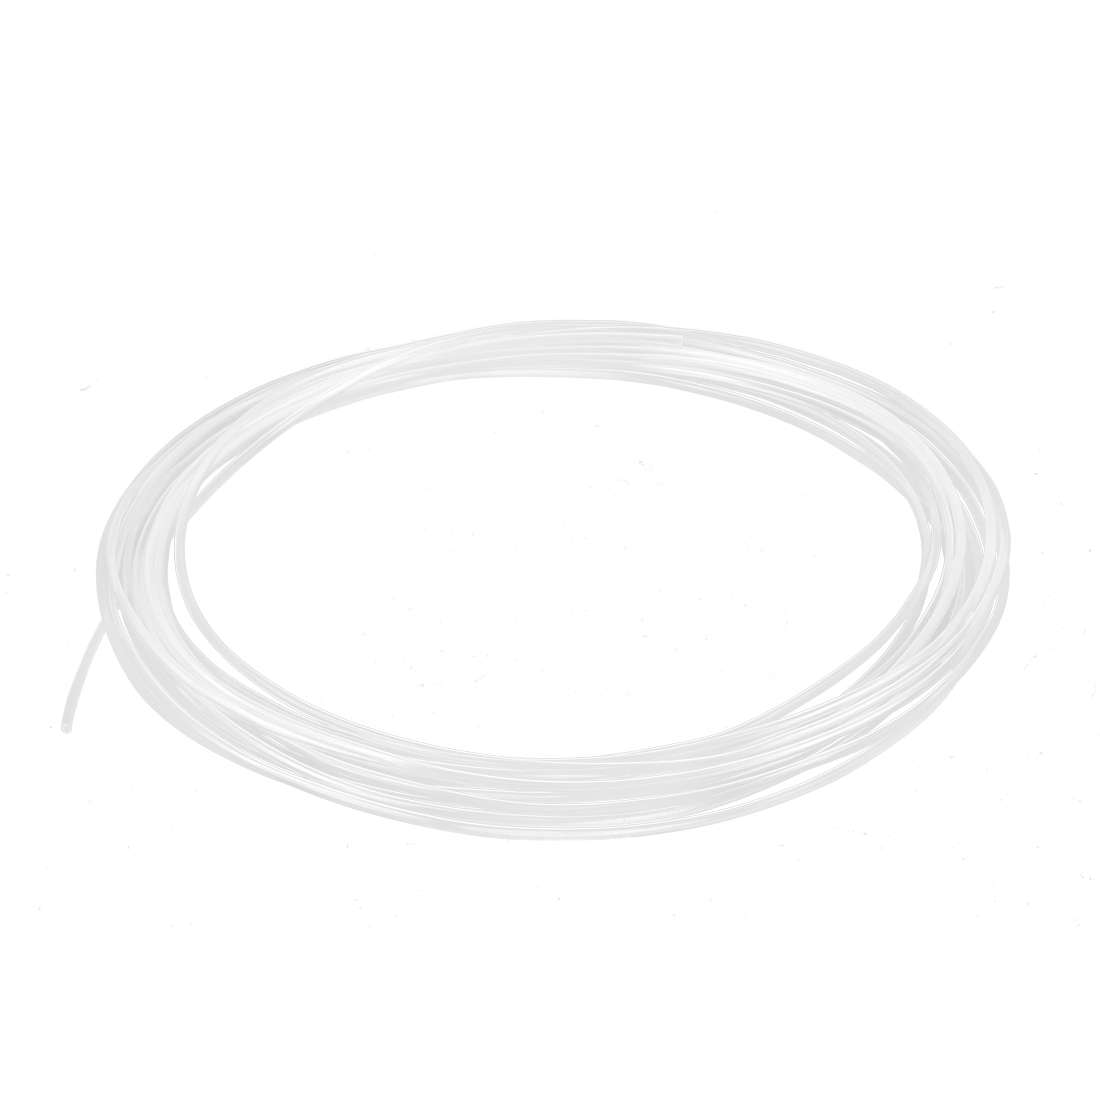 5M 0.8mm Dia Polyolefin 2:1 Ultra Thin Heat Shrink Tubing Tube for Stereo Audio